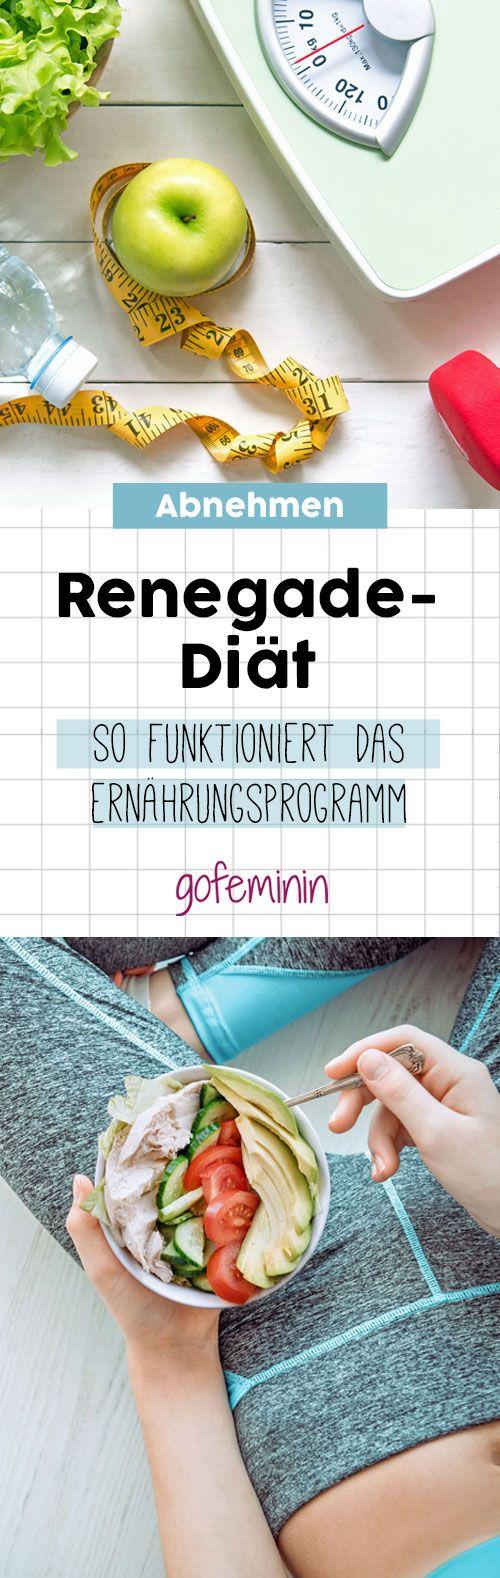 Weniger Körperfett, mehr Muskelmasse: Was steckt hinter der Renegade-Diät? #diät #renegadediät #renegade #abnehmen #gewicht #kalorien #fit #gesundheit #ernährung